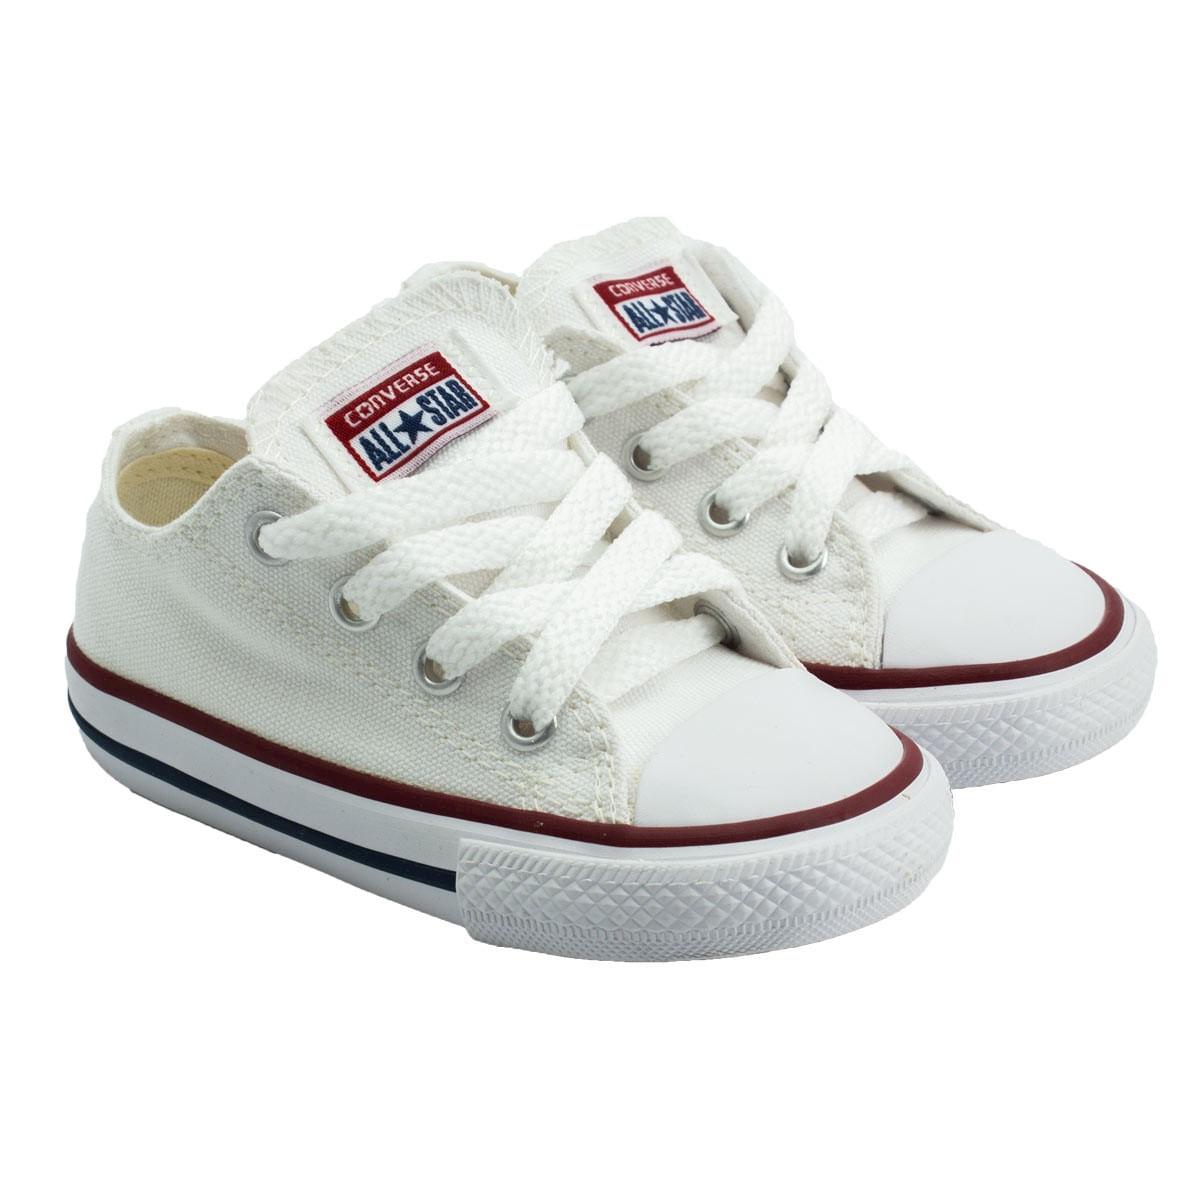 Tenis-Infantil-Chuck-Taylor-Converse-All-Star